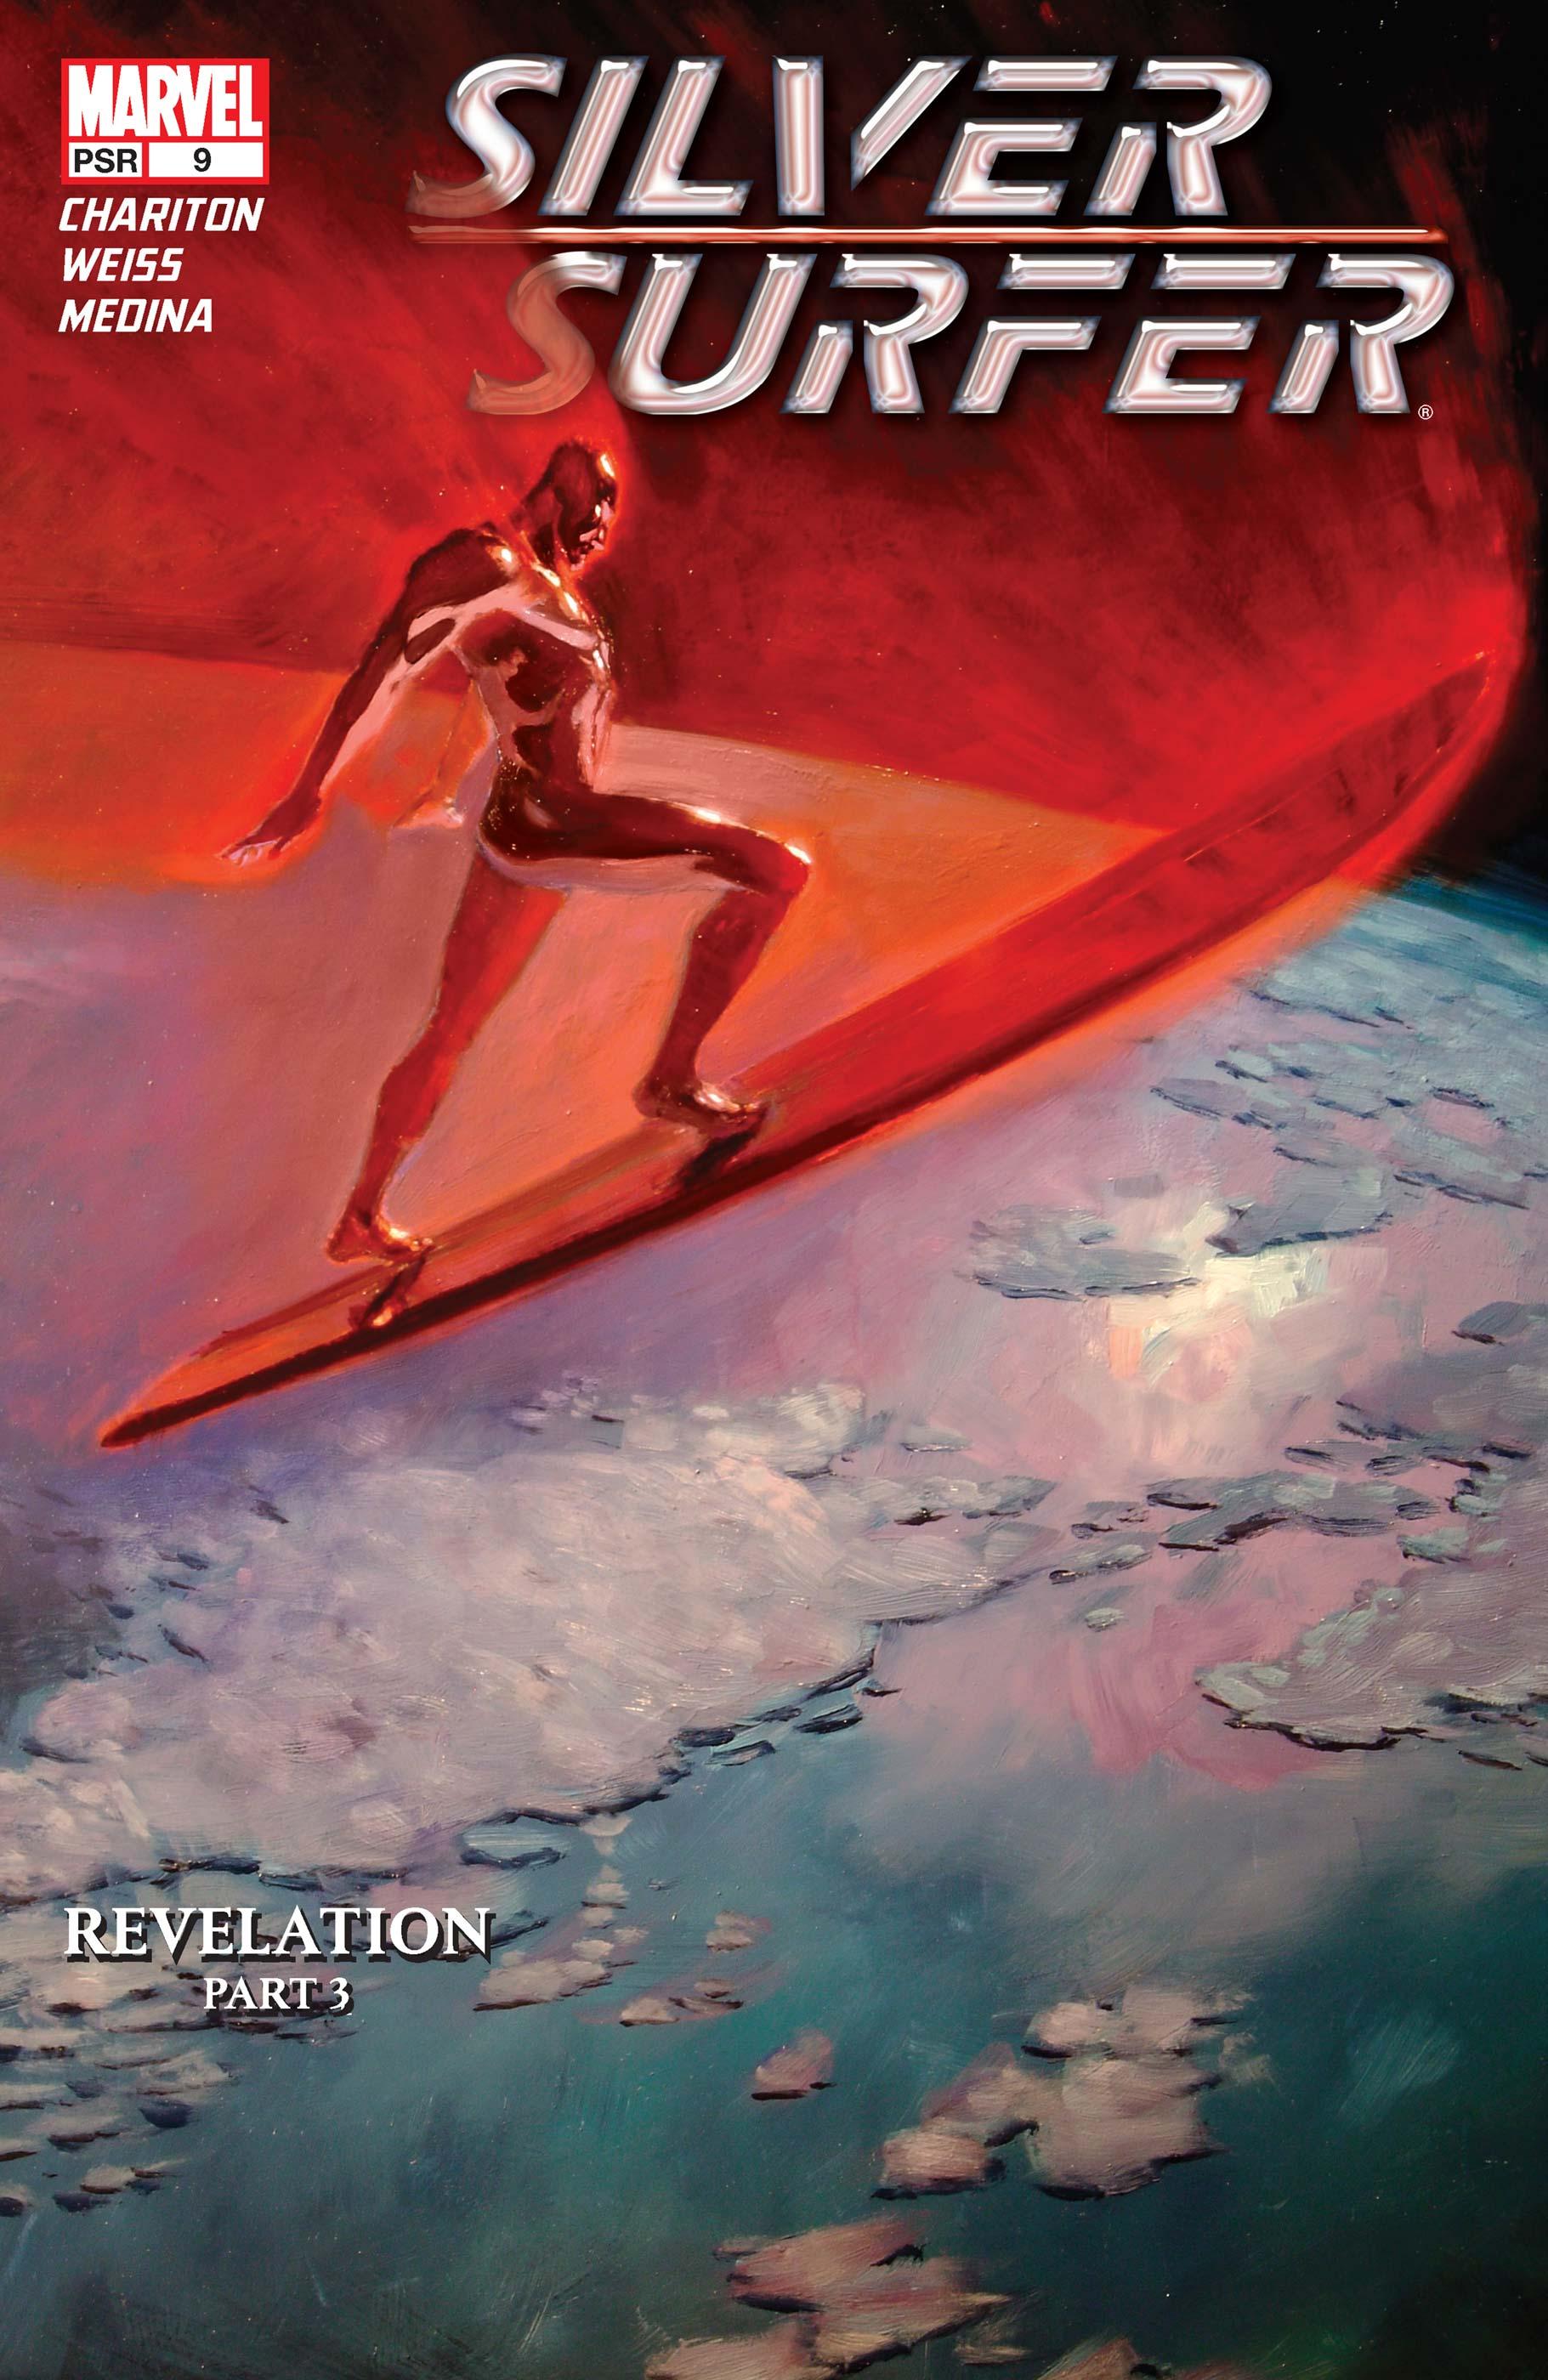 Silver Surfer (2003) #9